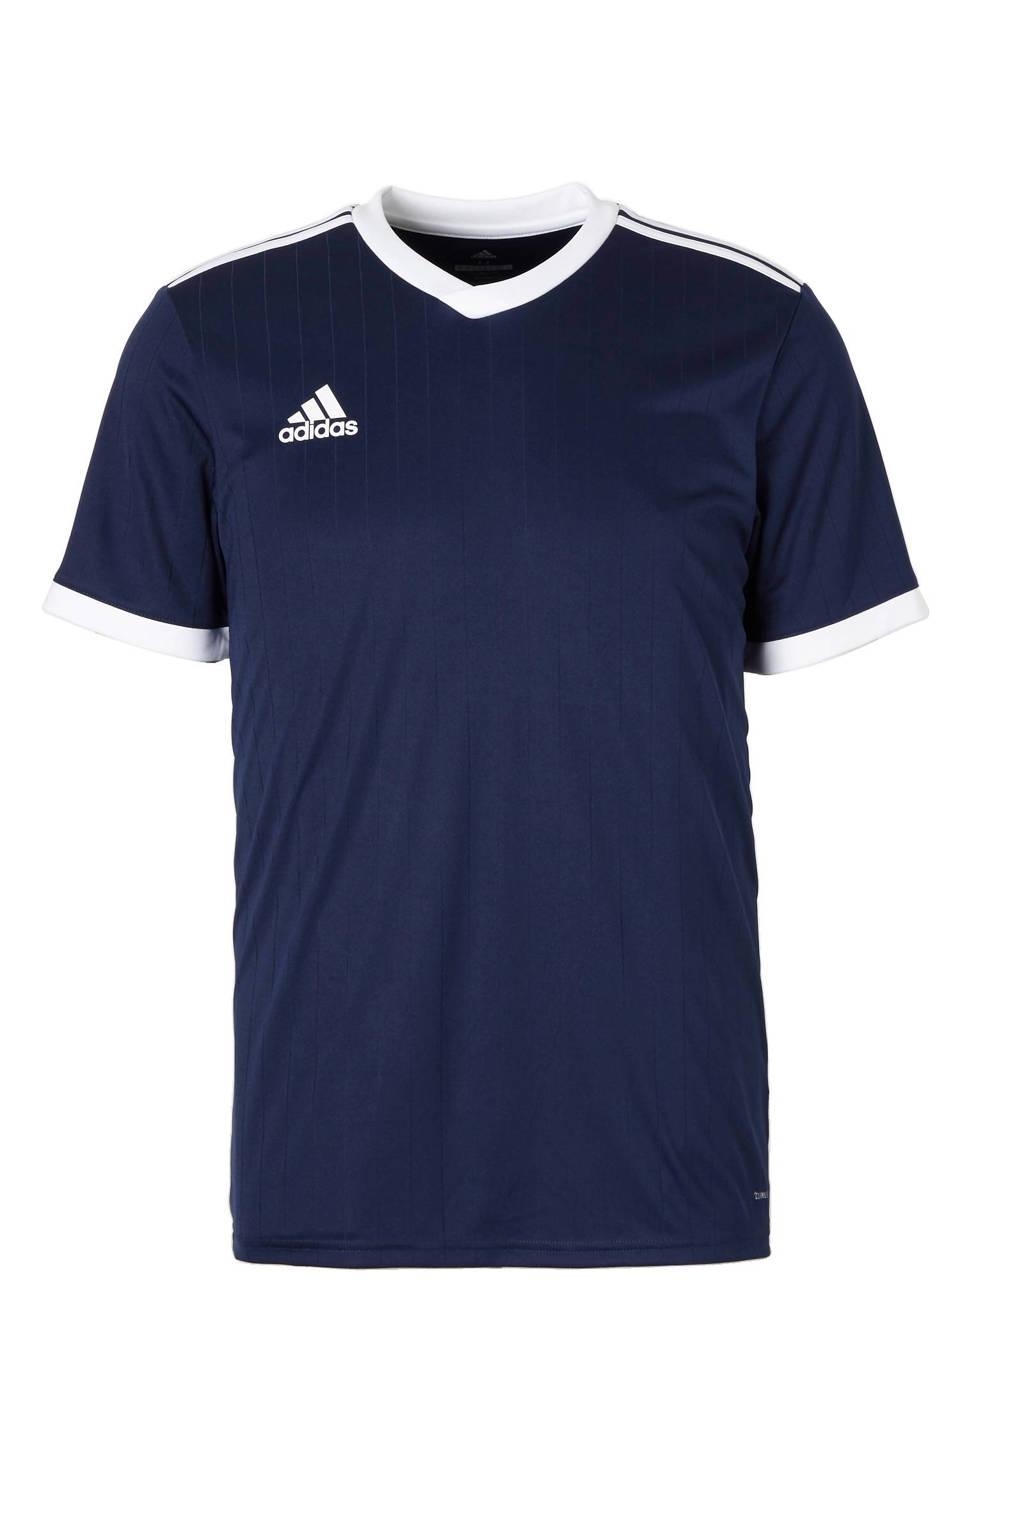 adidas Junior  sport T-shirt Tabela donkerblauw/wit, Donkerblauw/wit, Jongens/meisjes